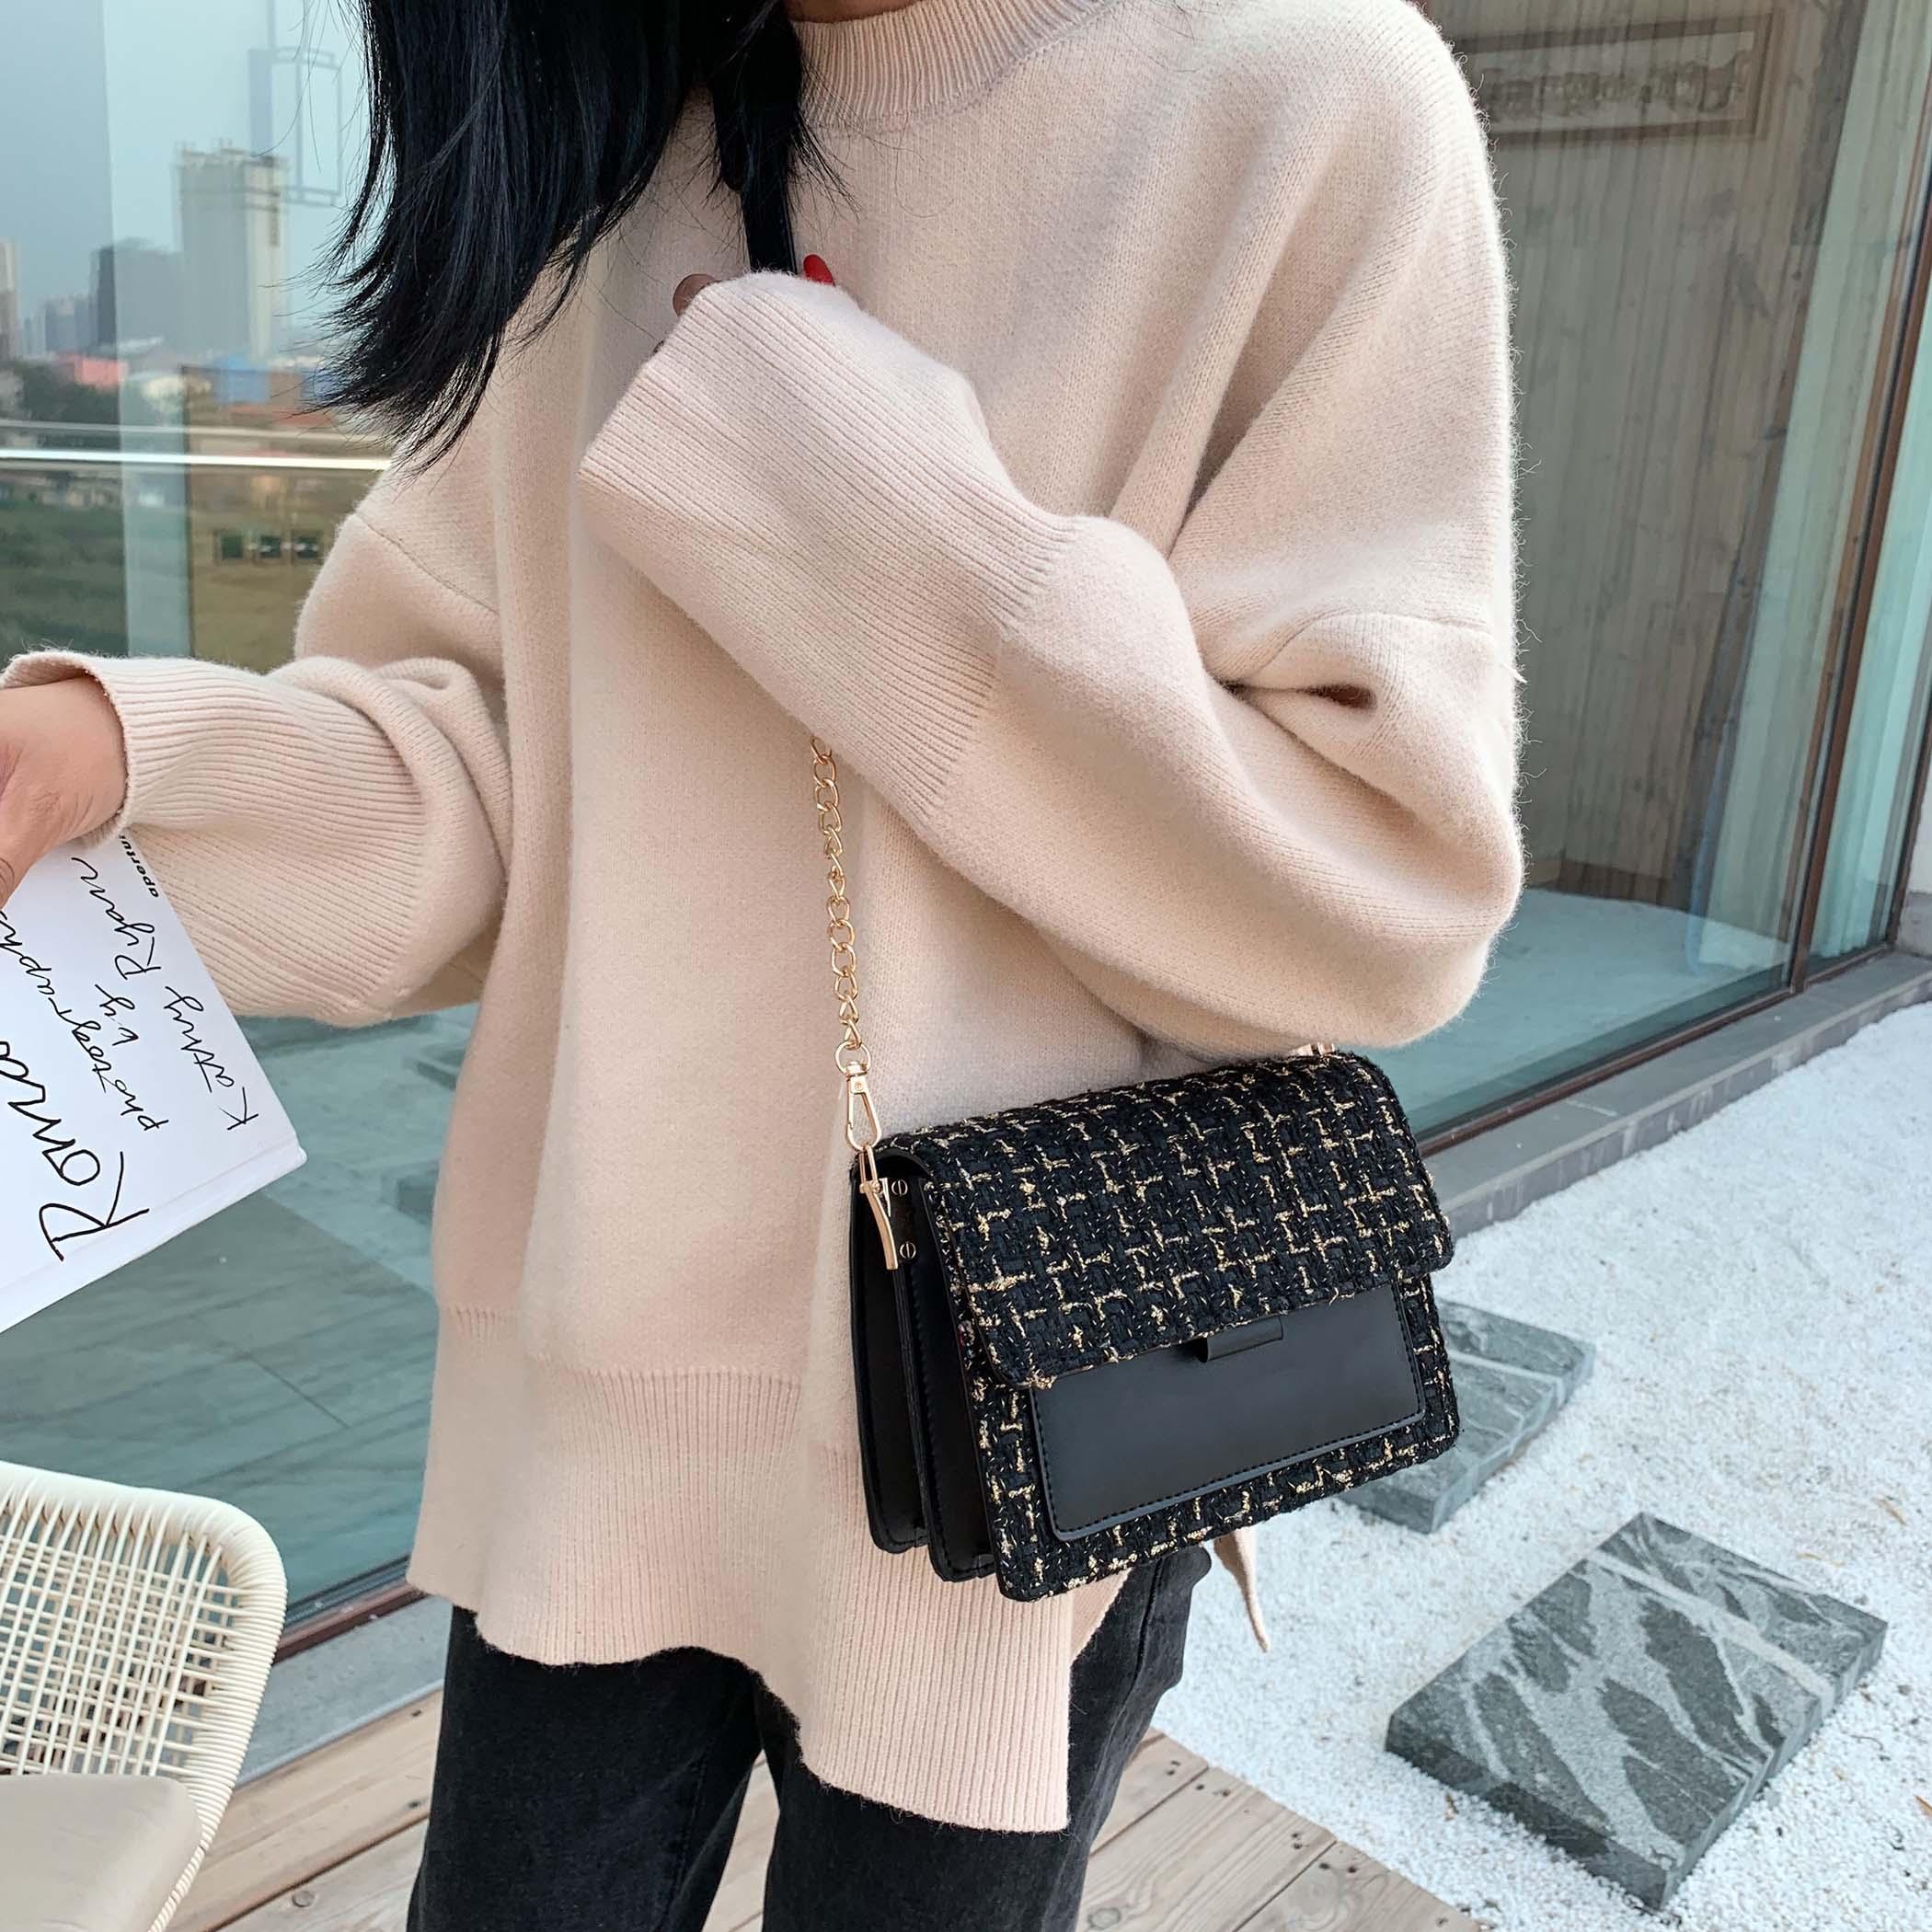 Cotton Handbags Stop118 and